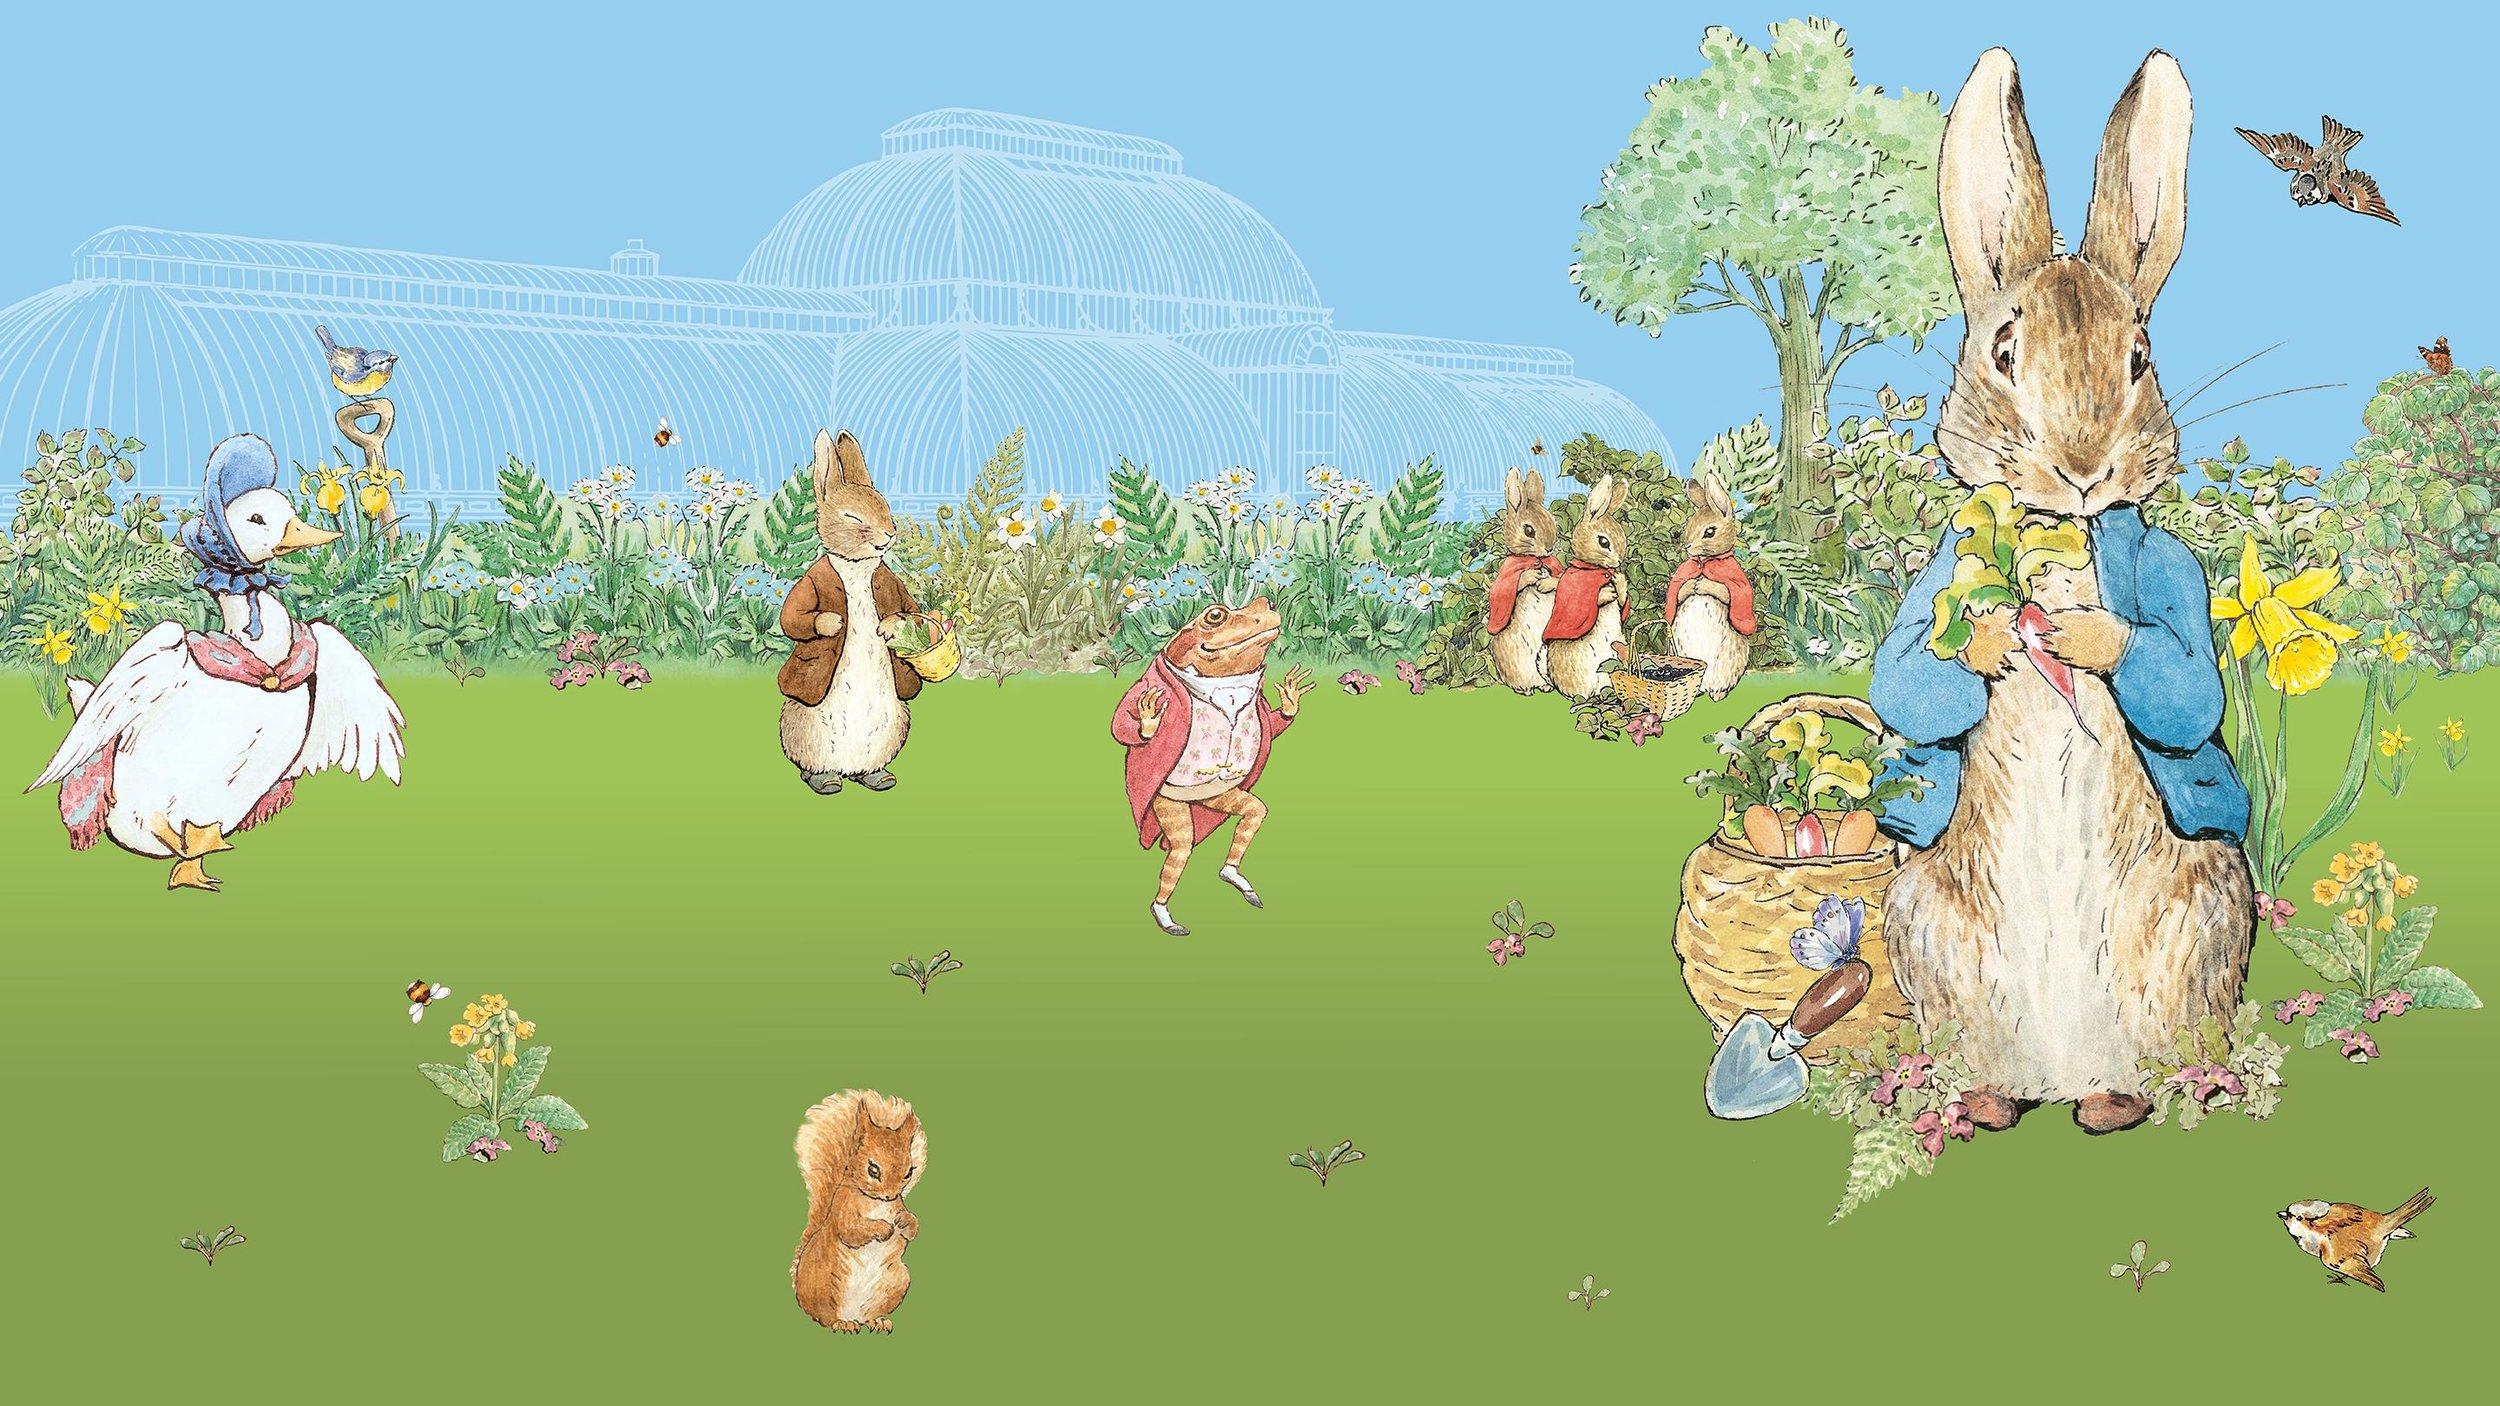 10886_Peter Rabbit_Digital_Hero Image_2880x1620px_ID_AW-final.jpg